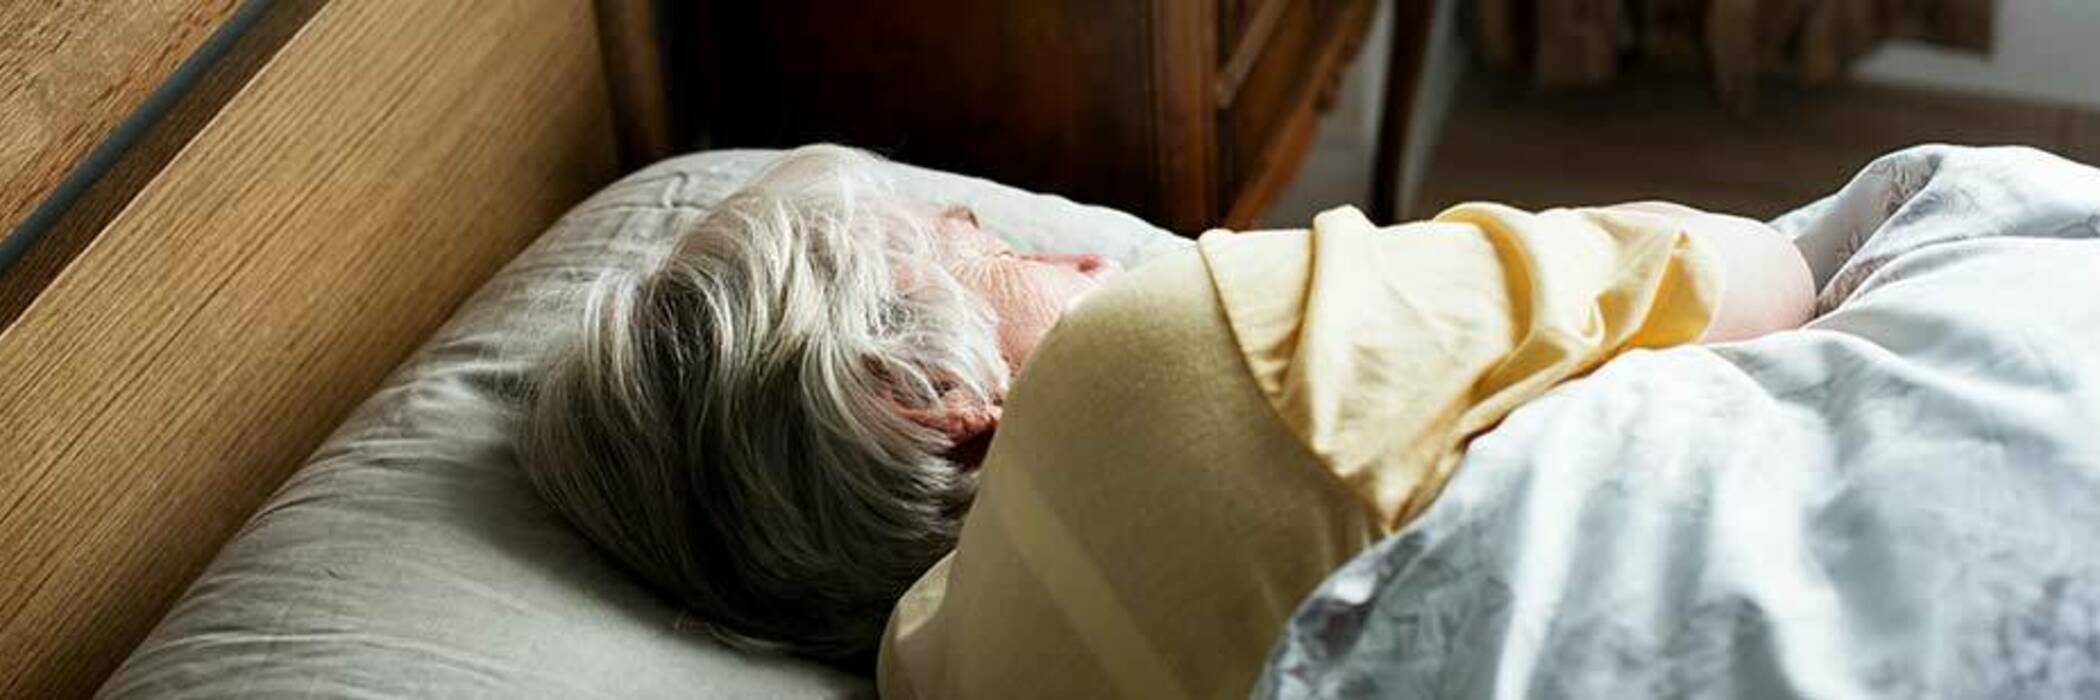 Elderly woman in bed in rest home.